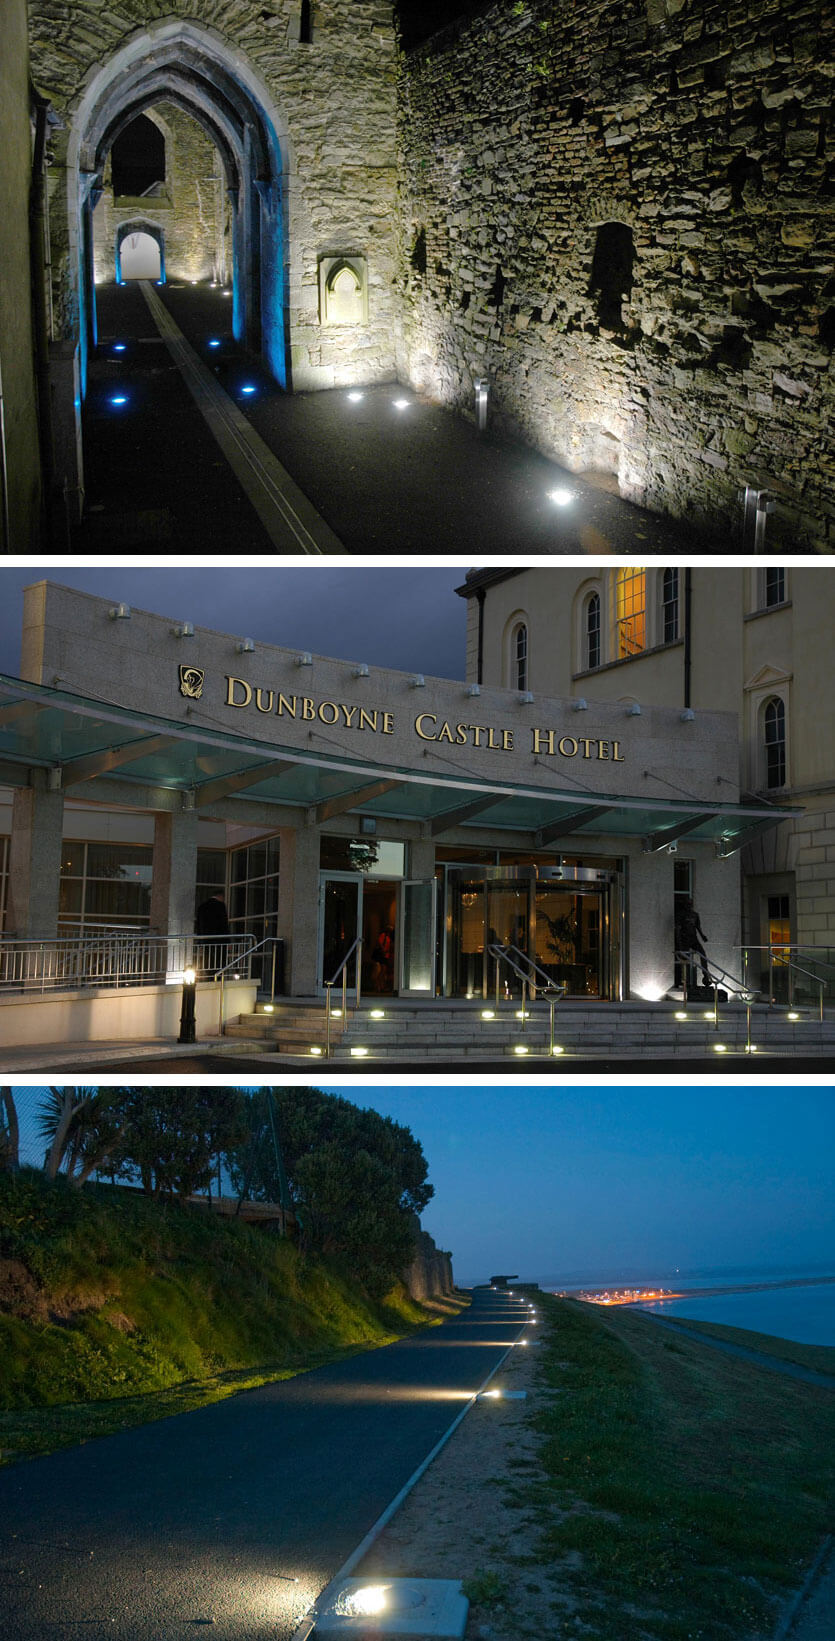 External Architectural Lighting